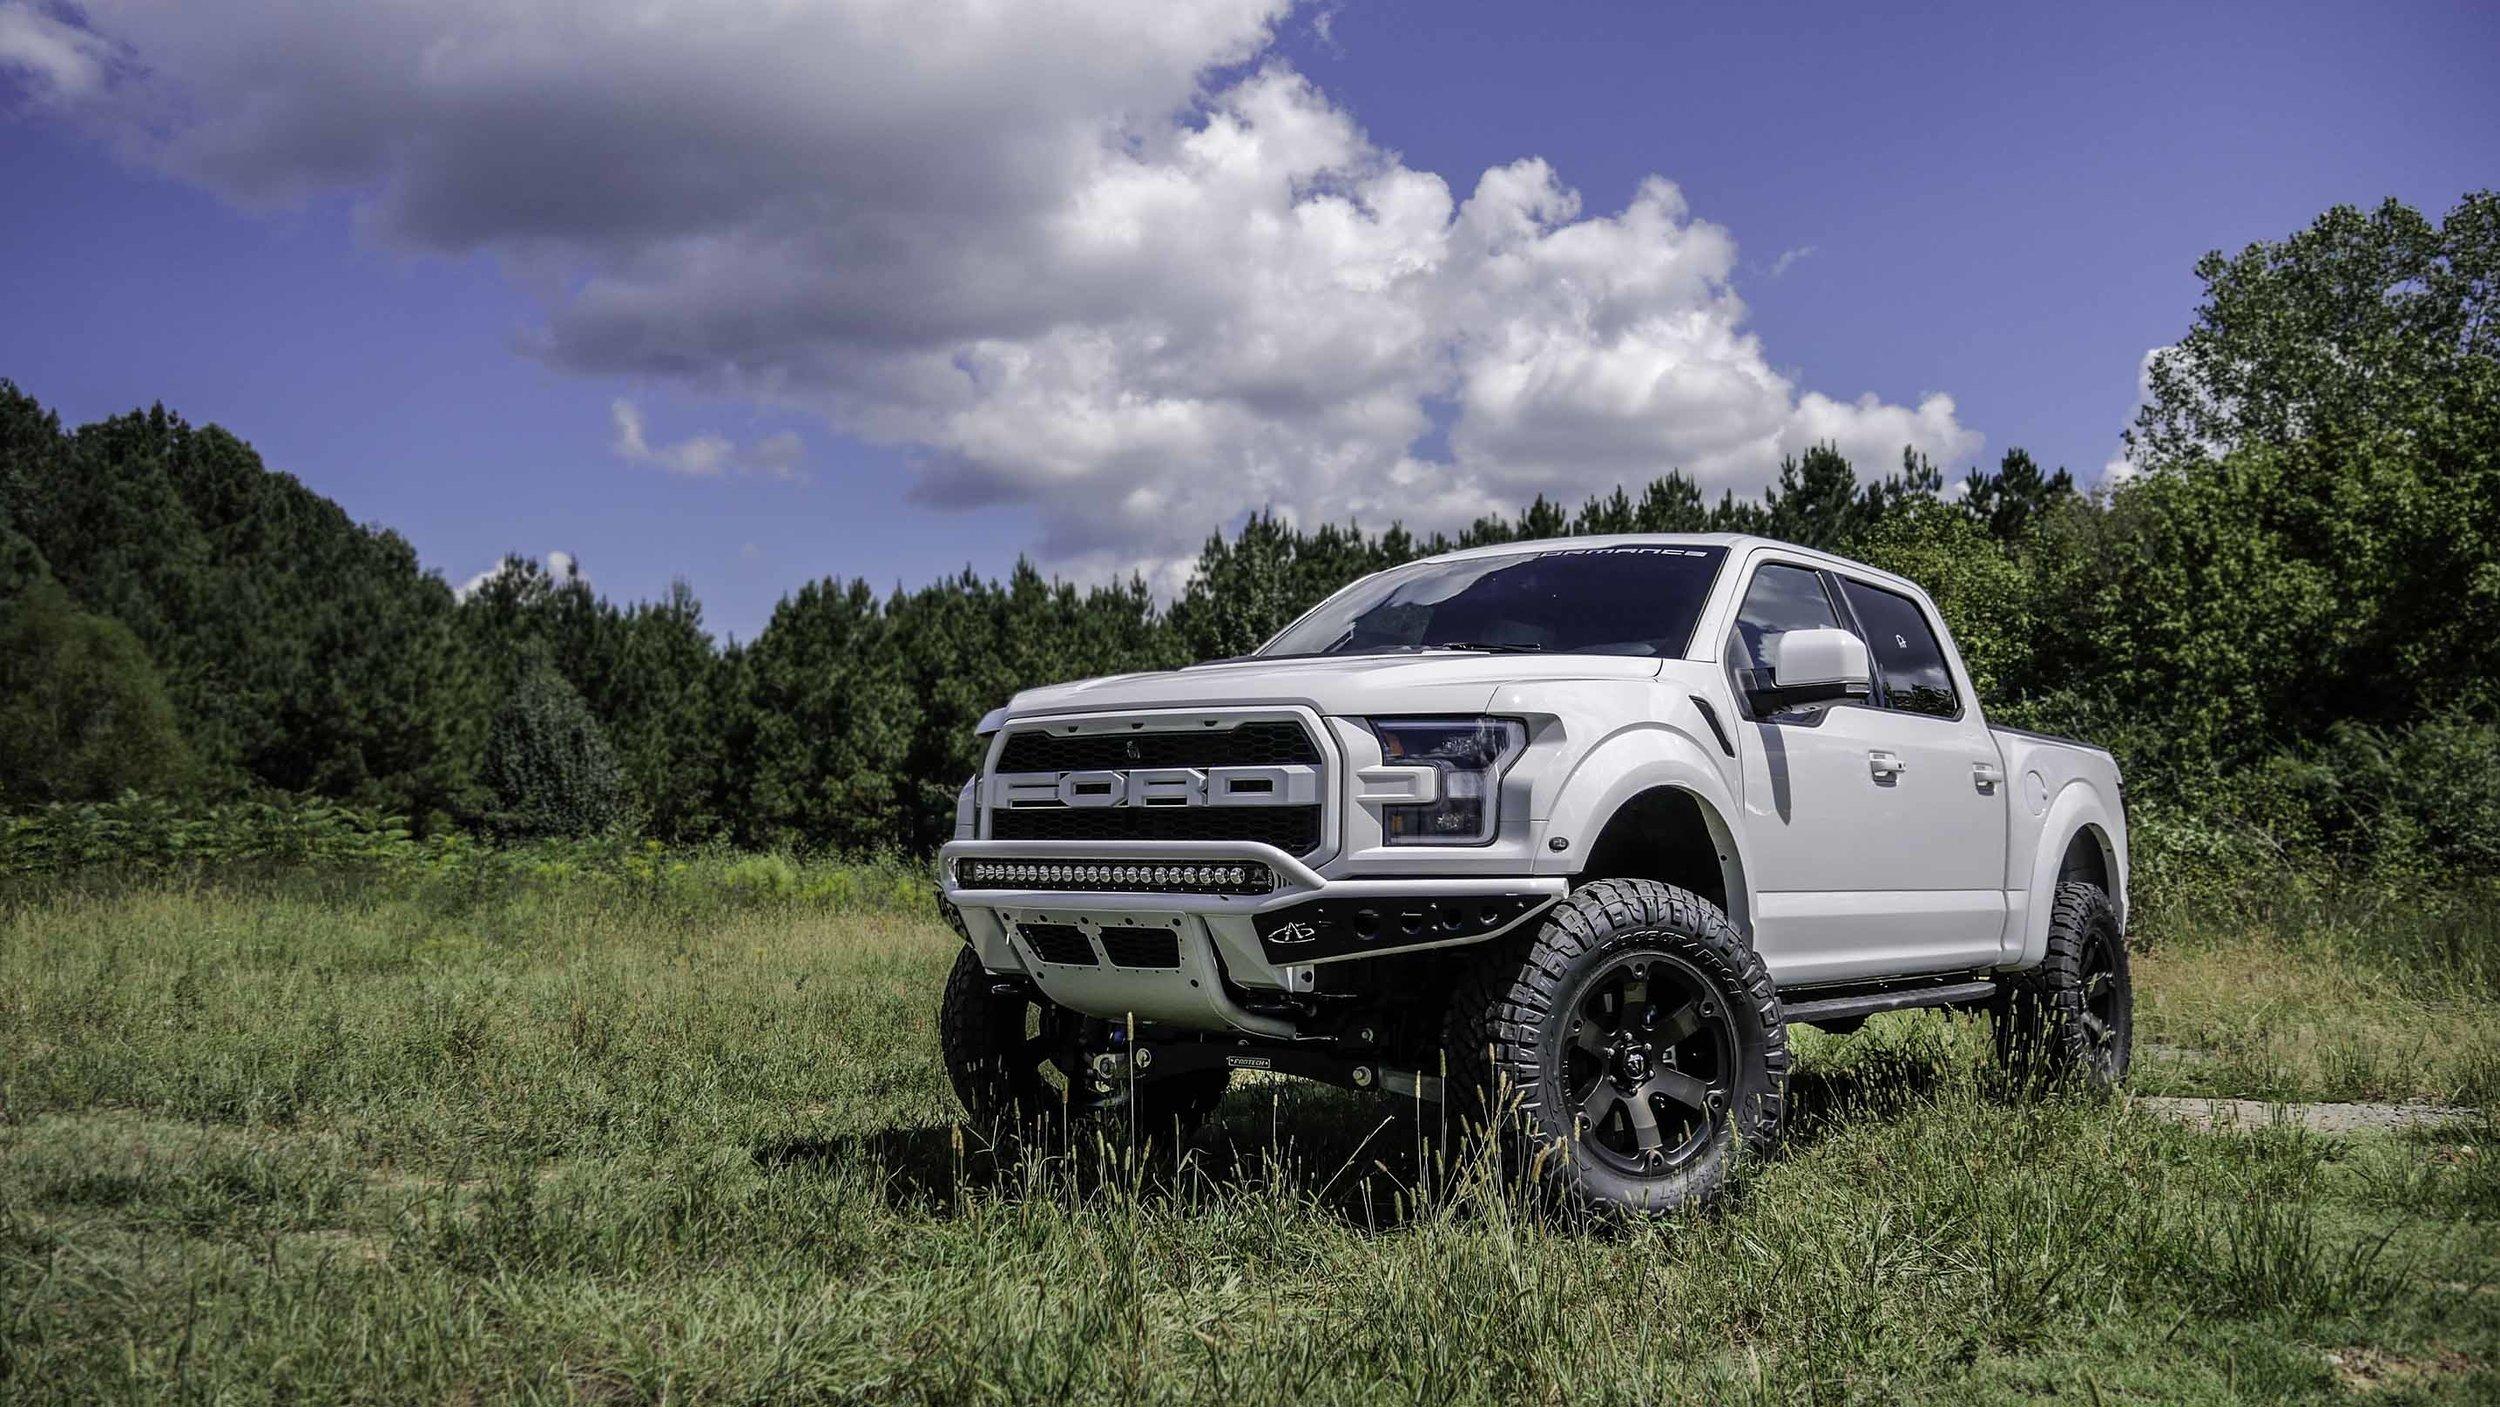 Sca Ford Raptor Sca Performance Black Widow Lifted Trucks